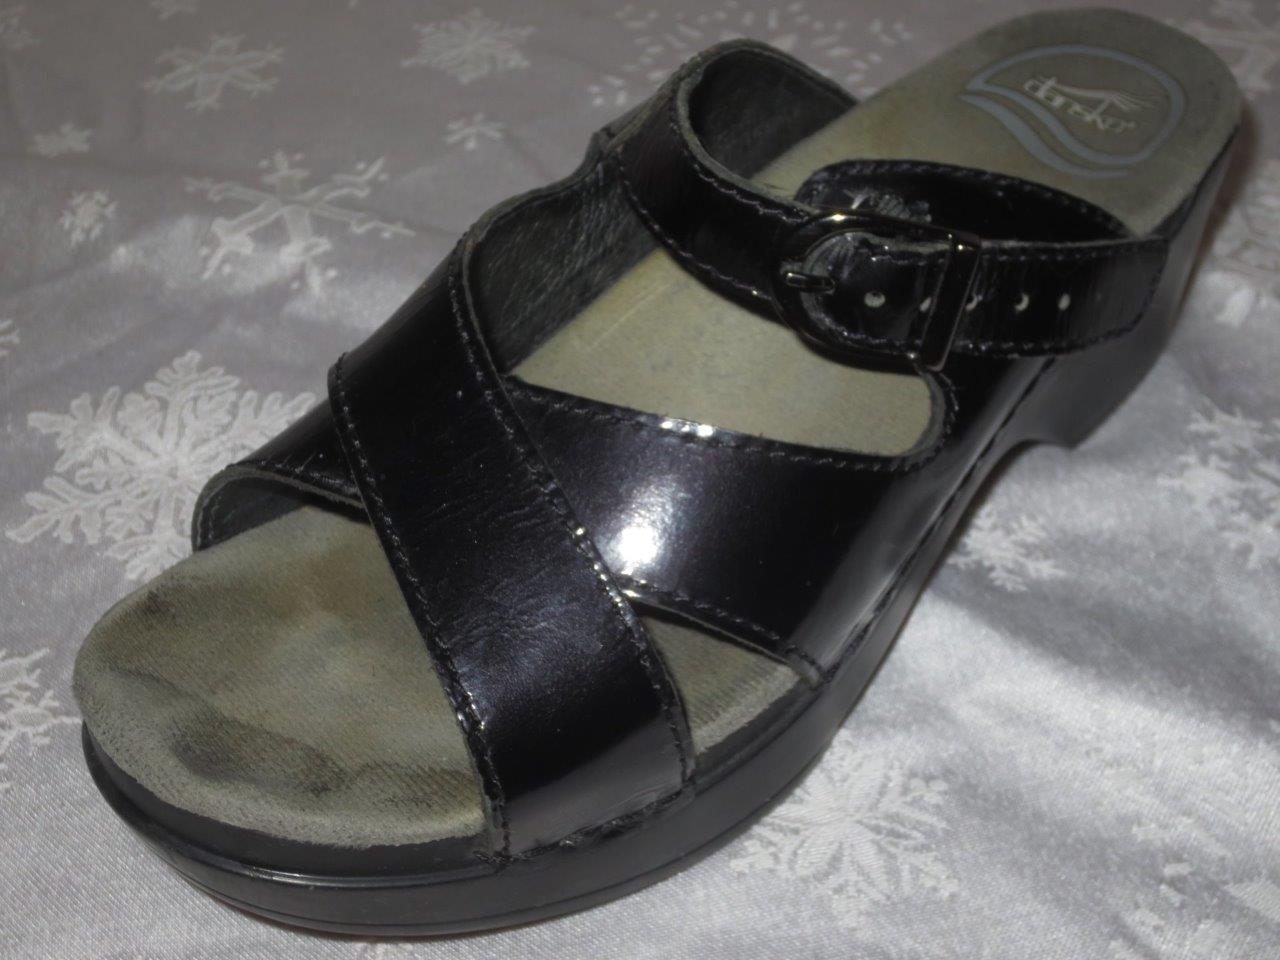 DANSKO Damenschuhe BLACK PATENT Sandales LEATHER Strappy MULES Sandales PATENT Schuhes Slides Clogs 36 6 98b2df